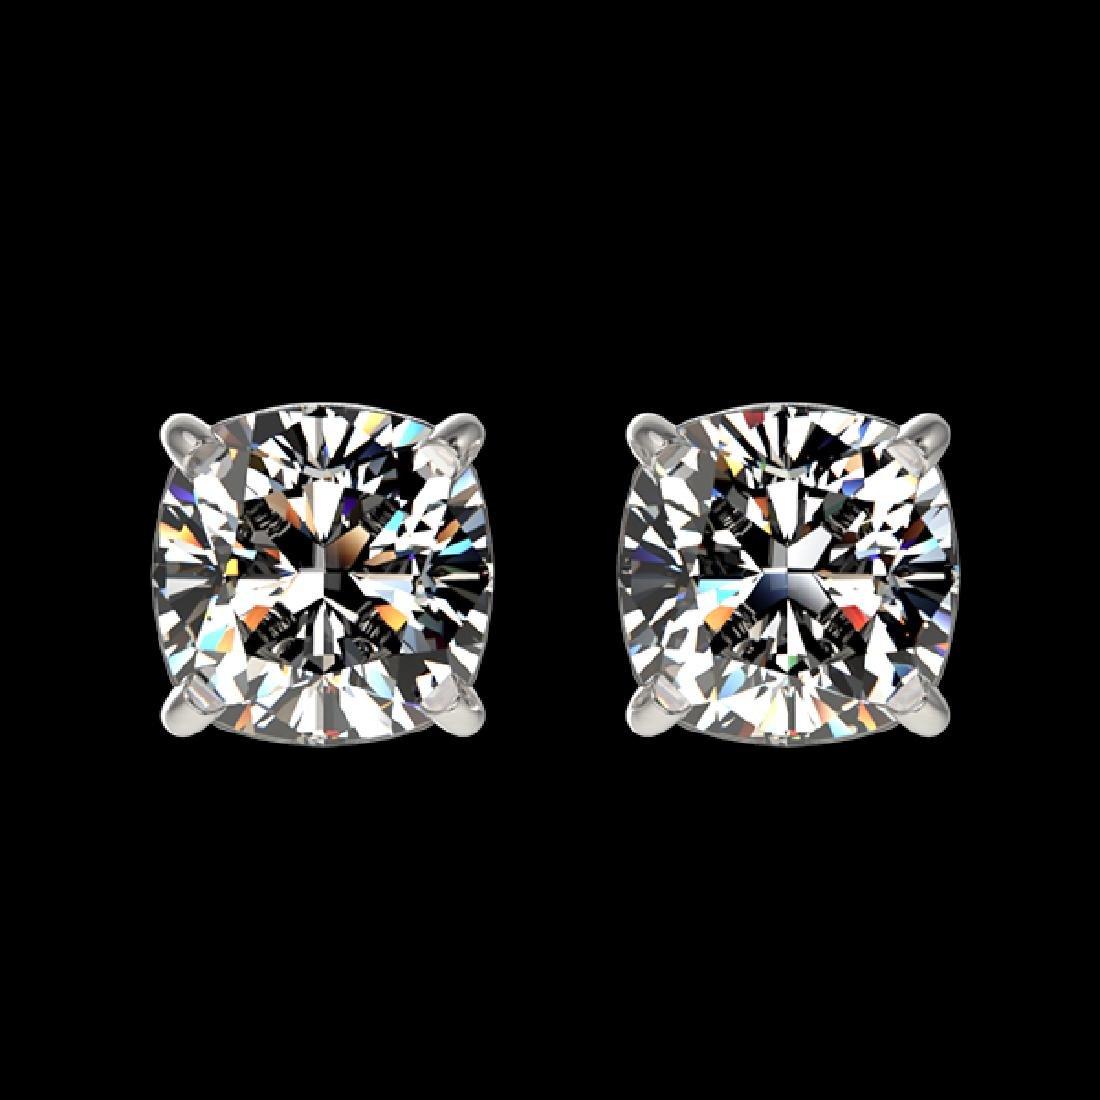 1 CTW Certified VS/SI Quality Cushion Cut Diamond Stud